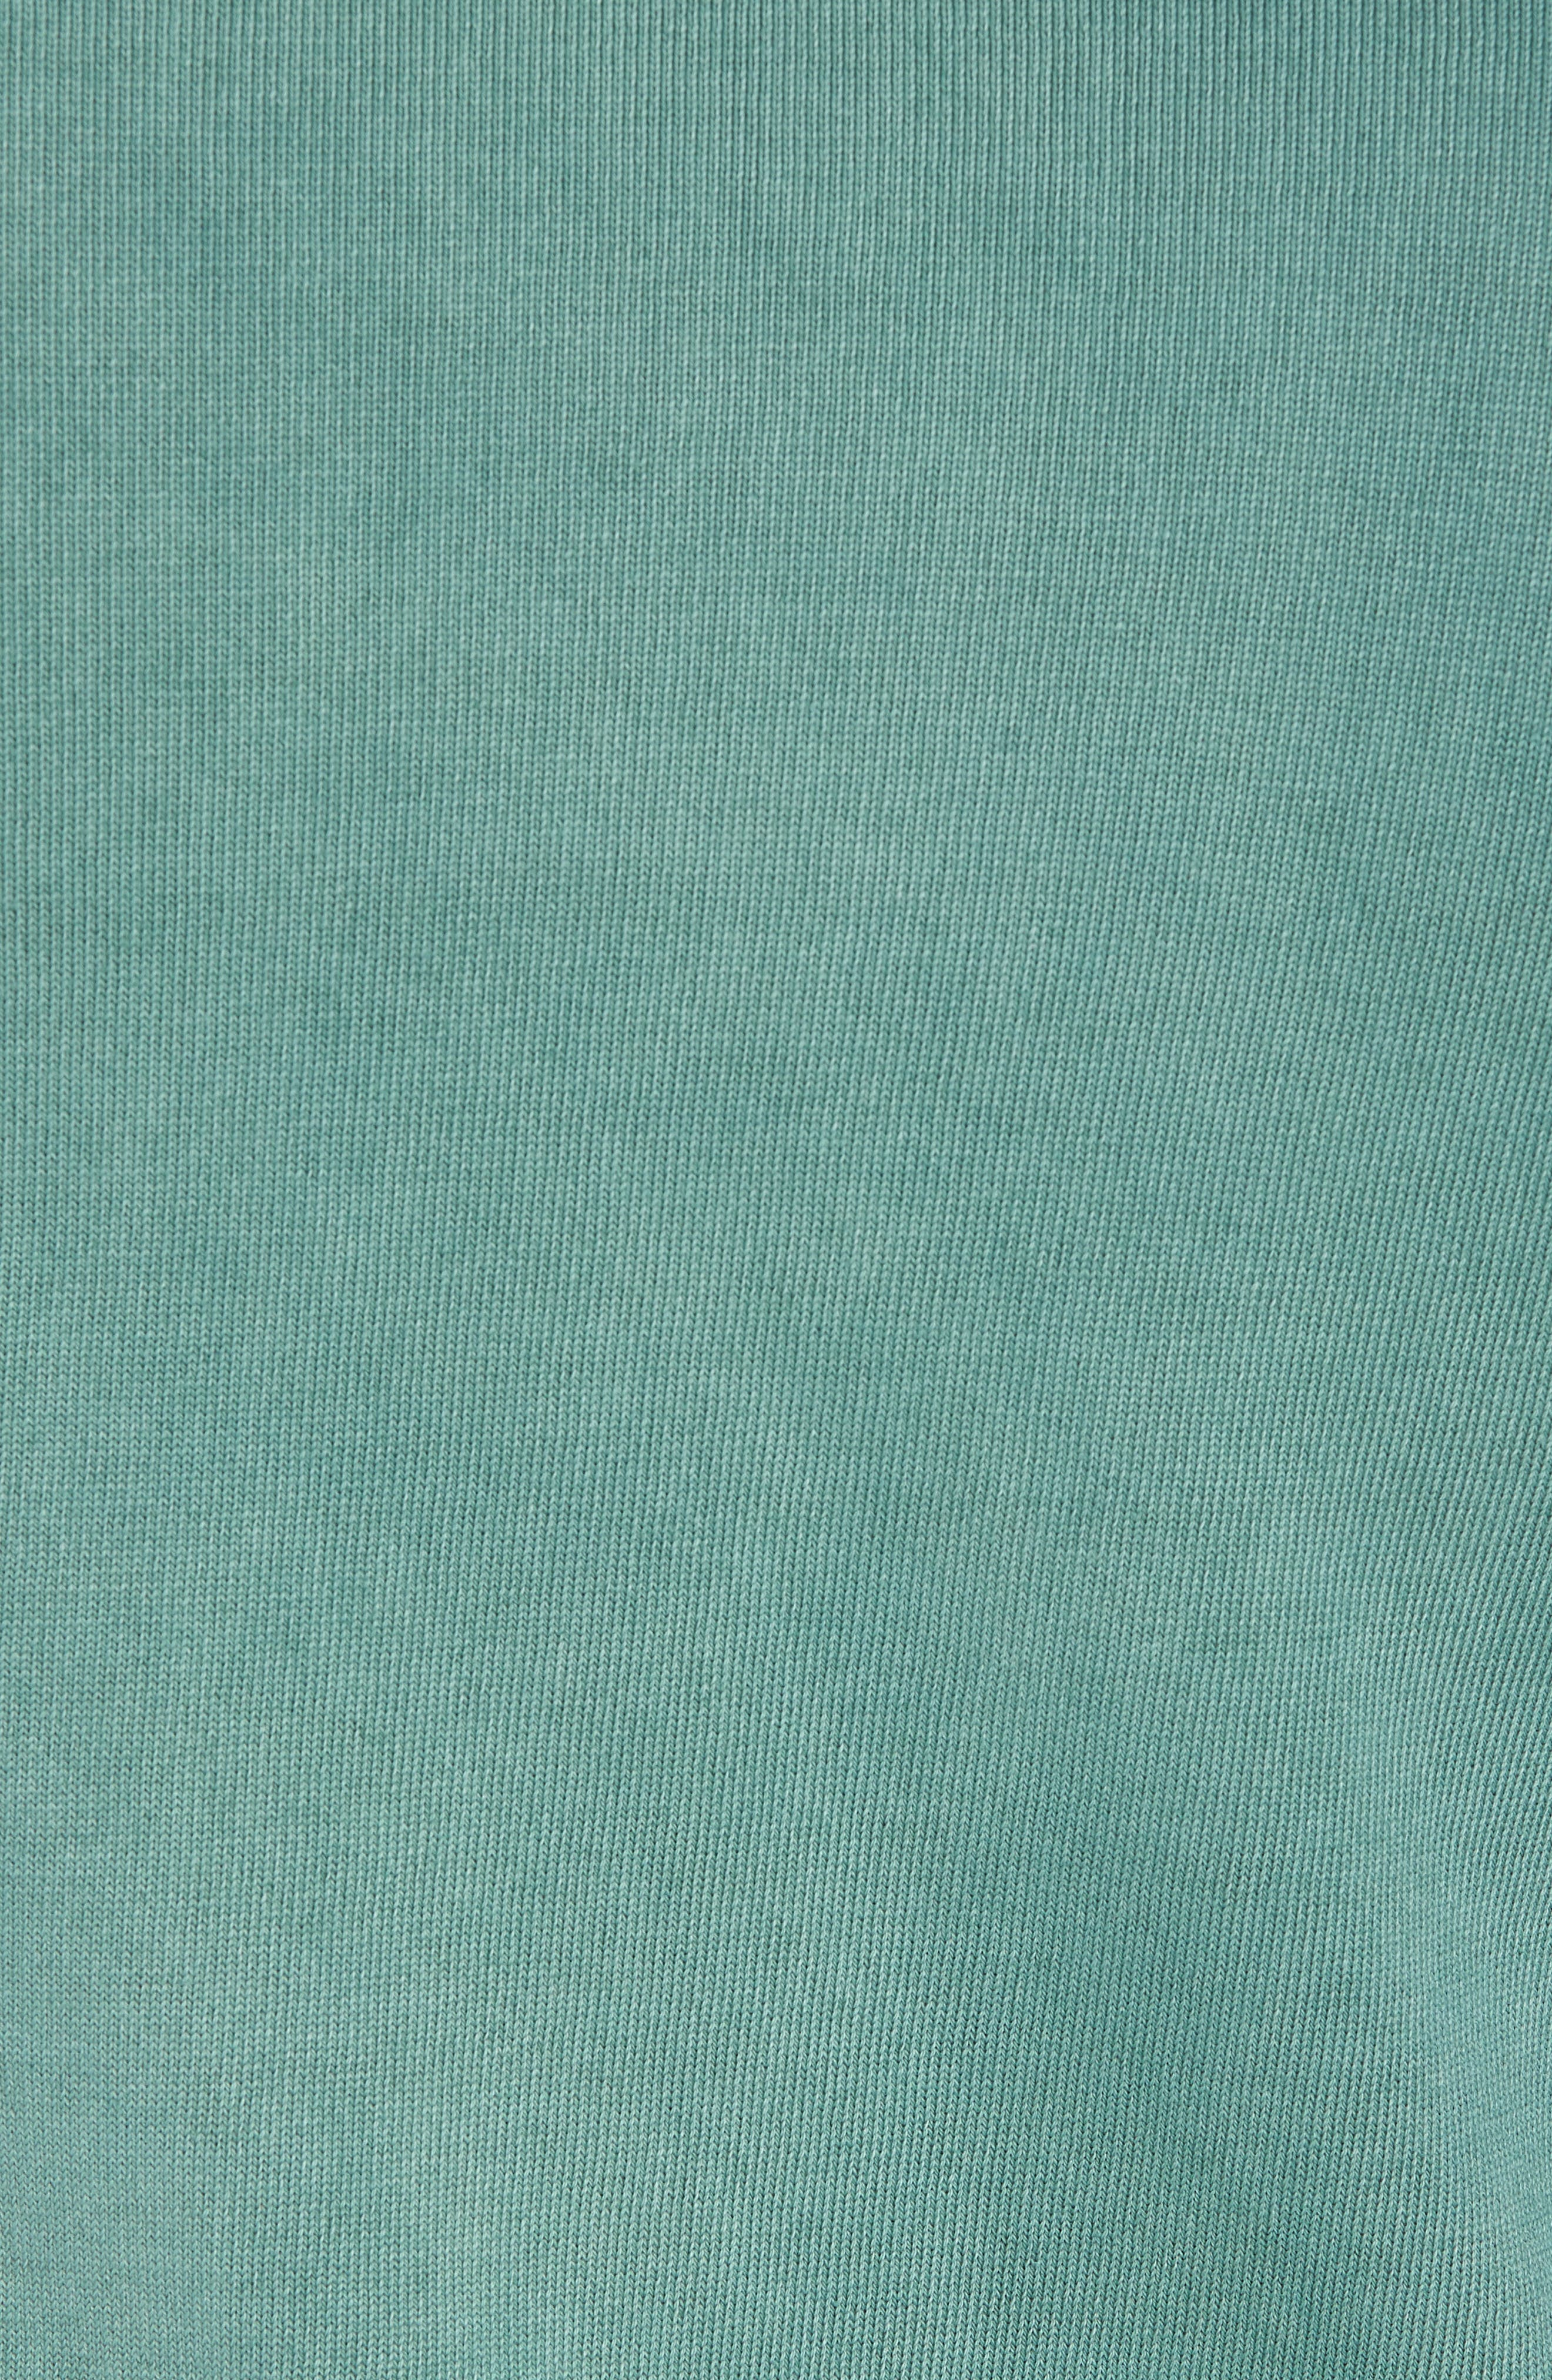 Stonewash Cotton Sweatshirt,                             Alternate thumbnail 5, color,                             333